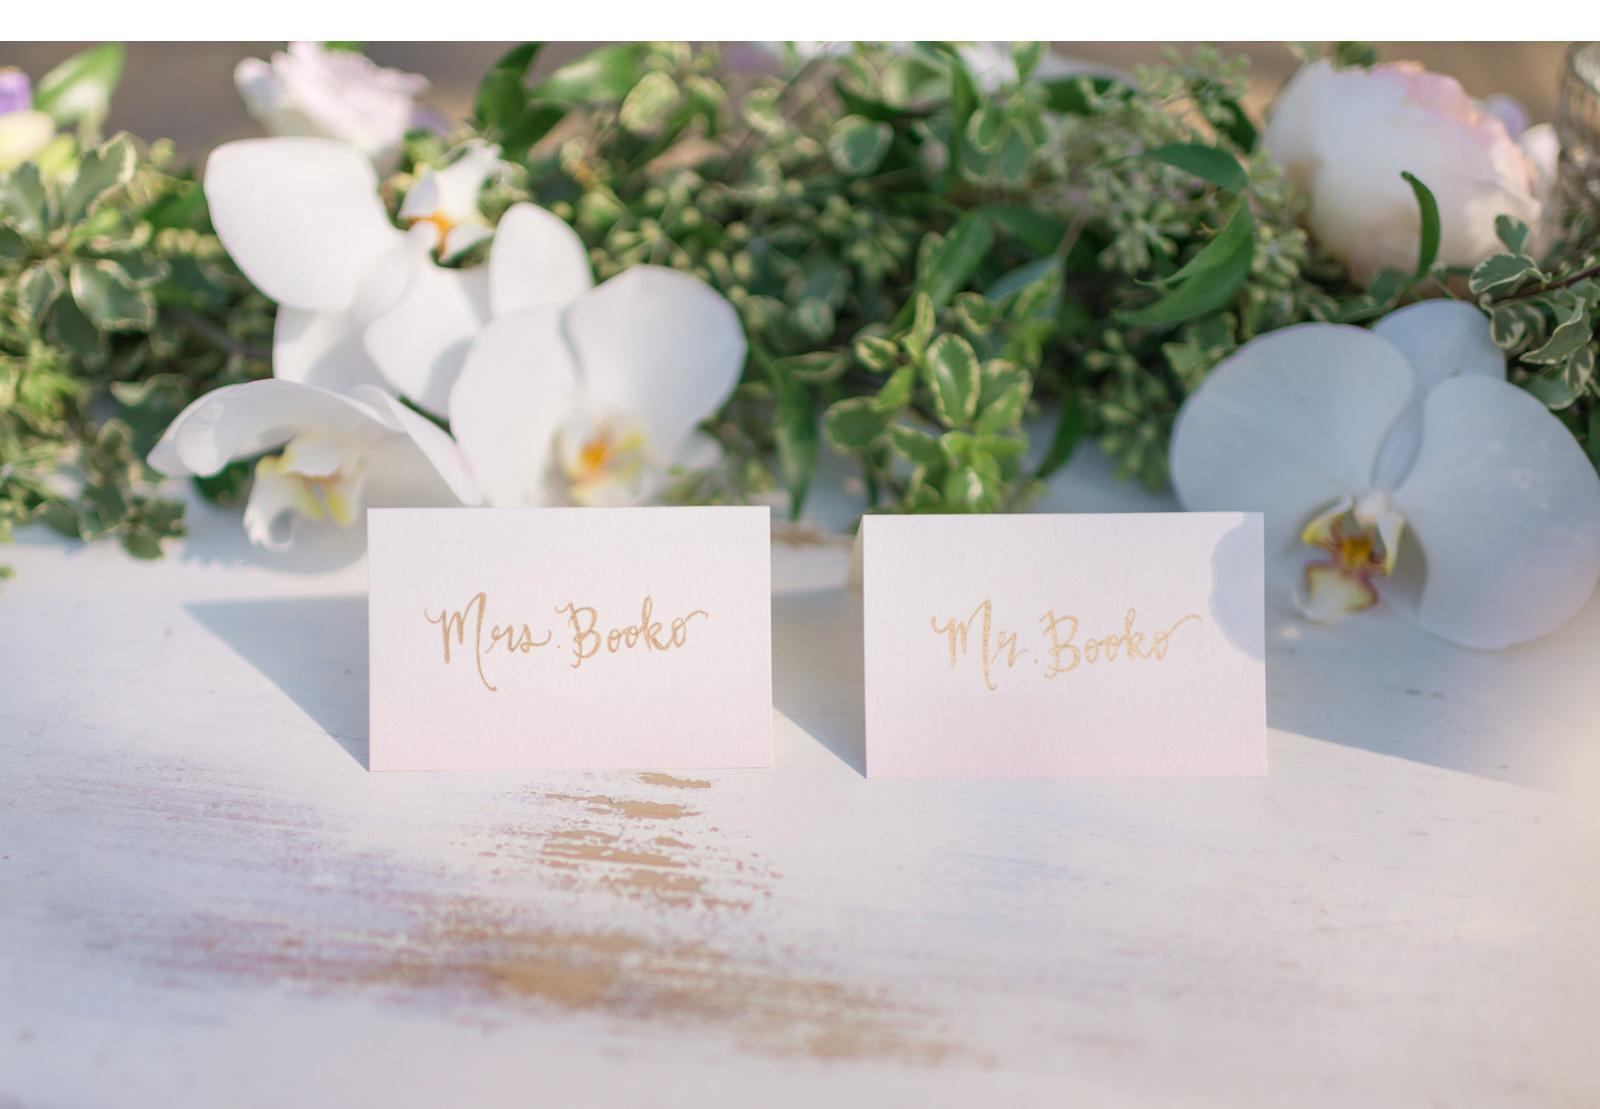 Temecula-Winery-Wedding-Natalie-Schutt-Photography_06.jpg